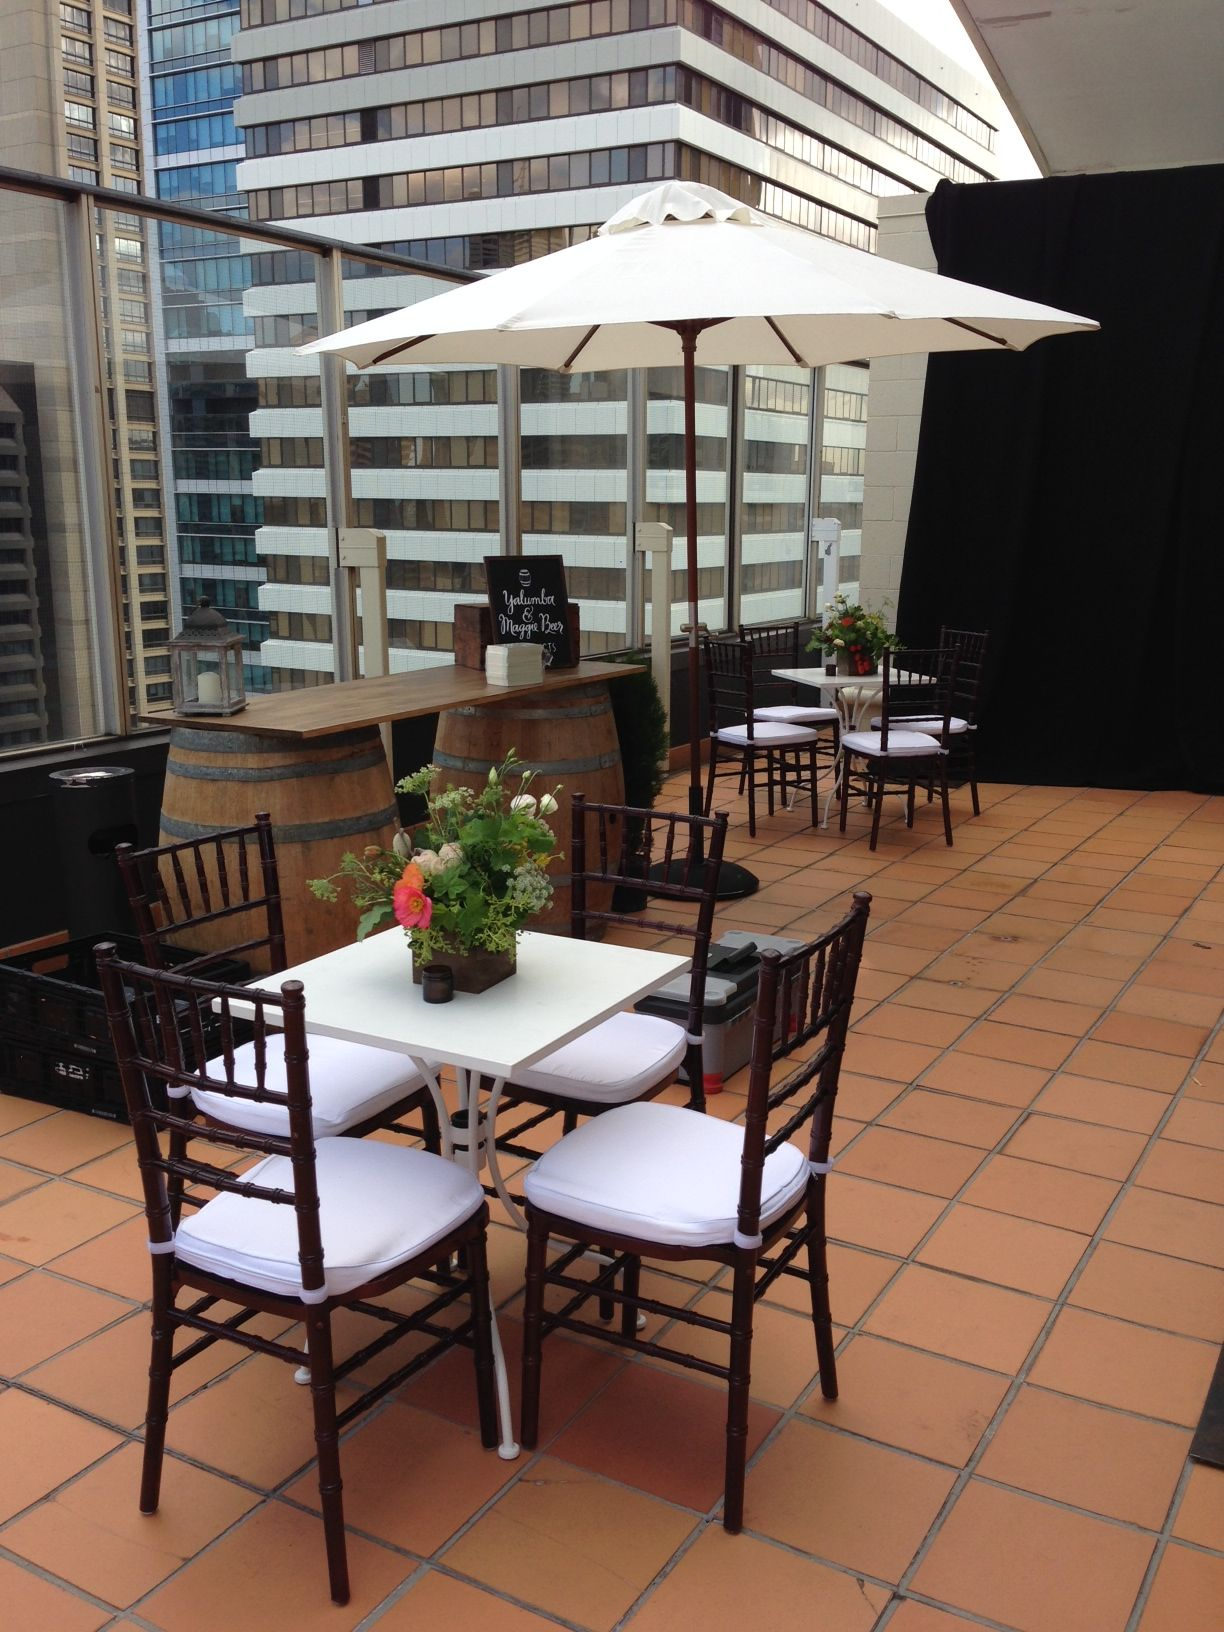 Hampton Event Hire Walnut Tiffany Chairs White Cafe Tables Market Umbrella Servicing Byron Bay Gold Coast Brisbane